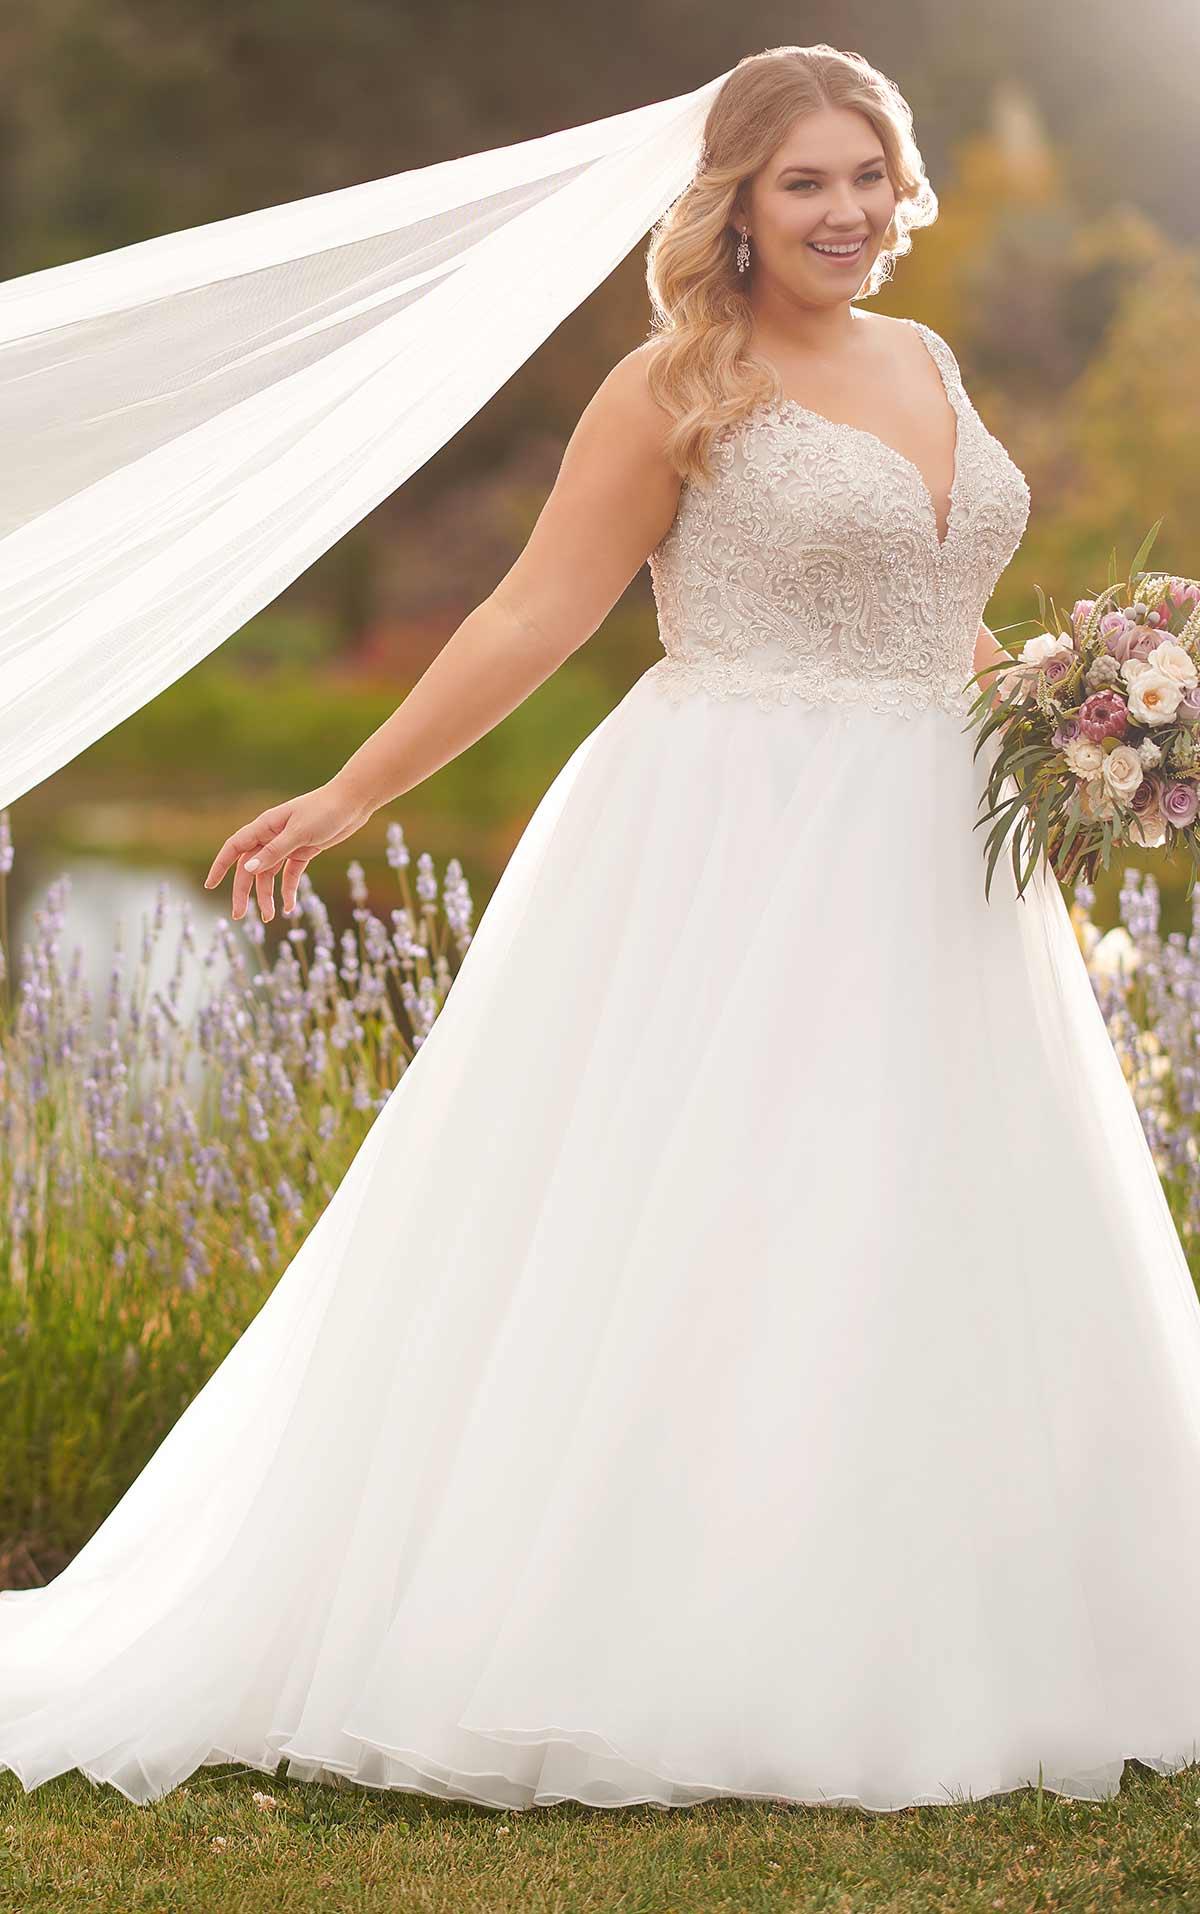 The Curvy Bride S Guide To Plus Size Wedding Dresses Wedding Journal,Second Hand Wedding Dresses Ireland